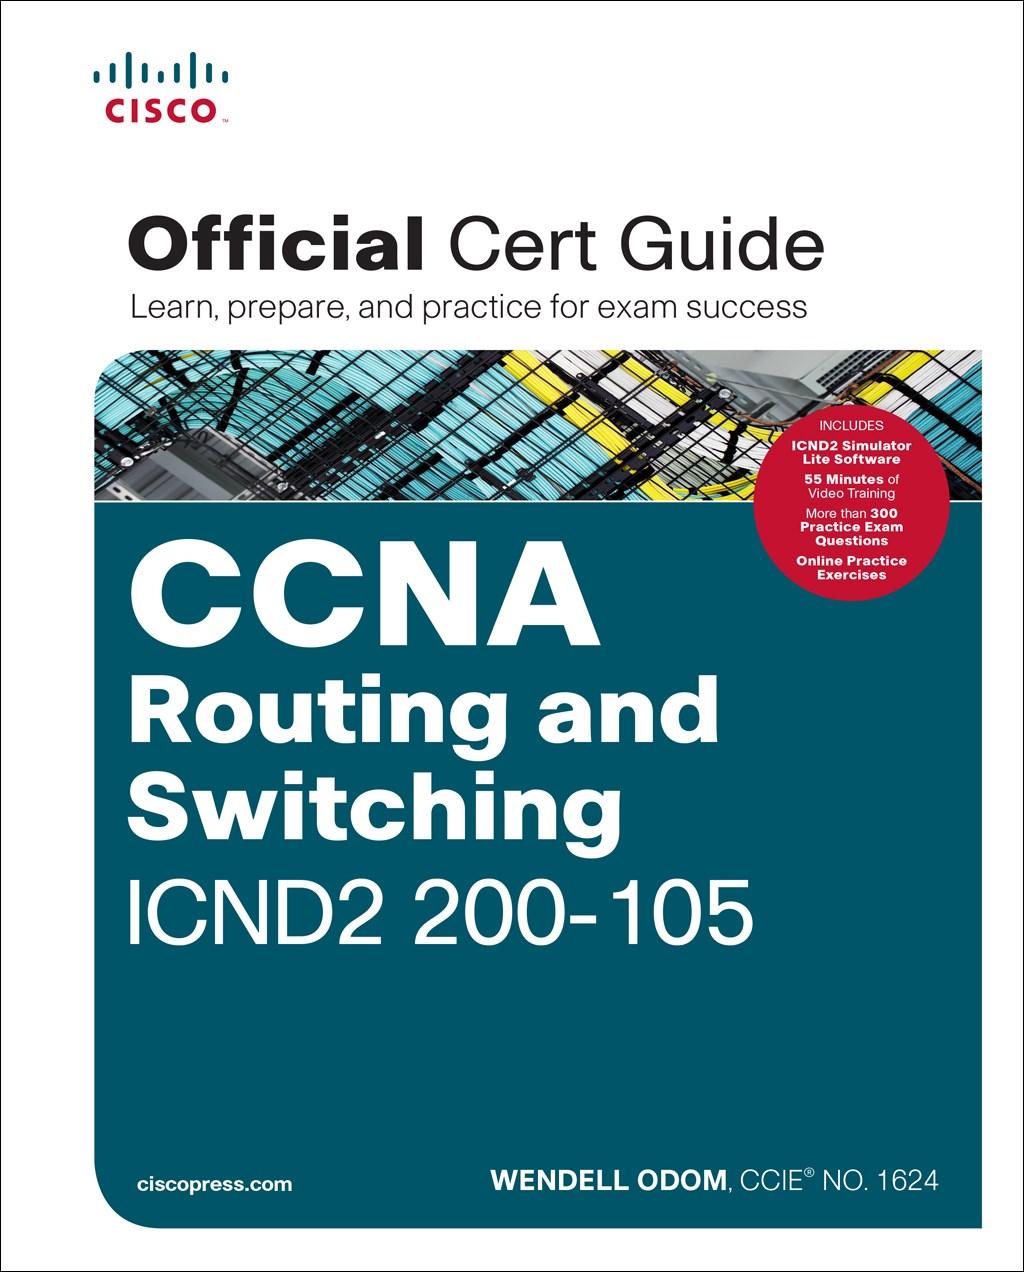 CCNA ICND2 100-105 Official Cert Guide